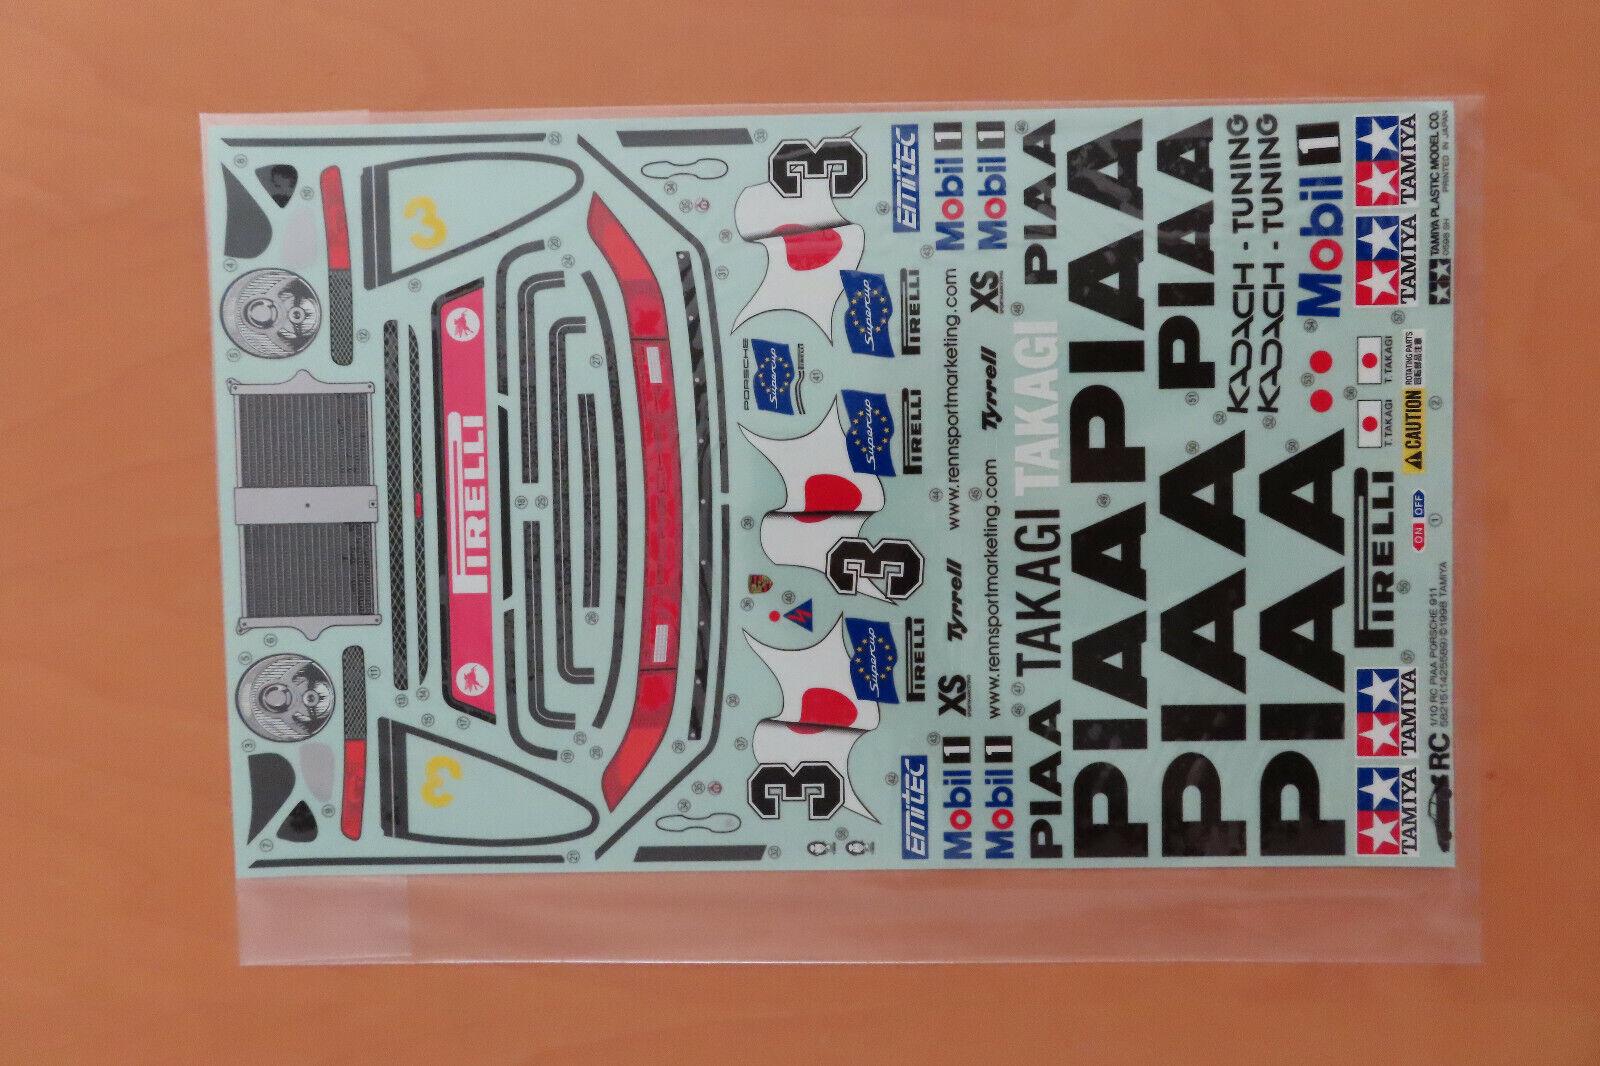 RC Tamiya Appendix 58 215 Piaa Porsche 911 gt2 neu NIB 1998